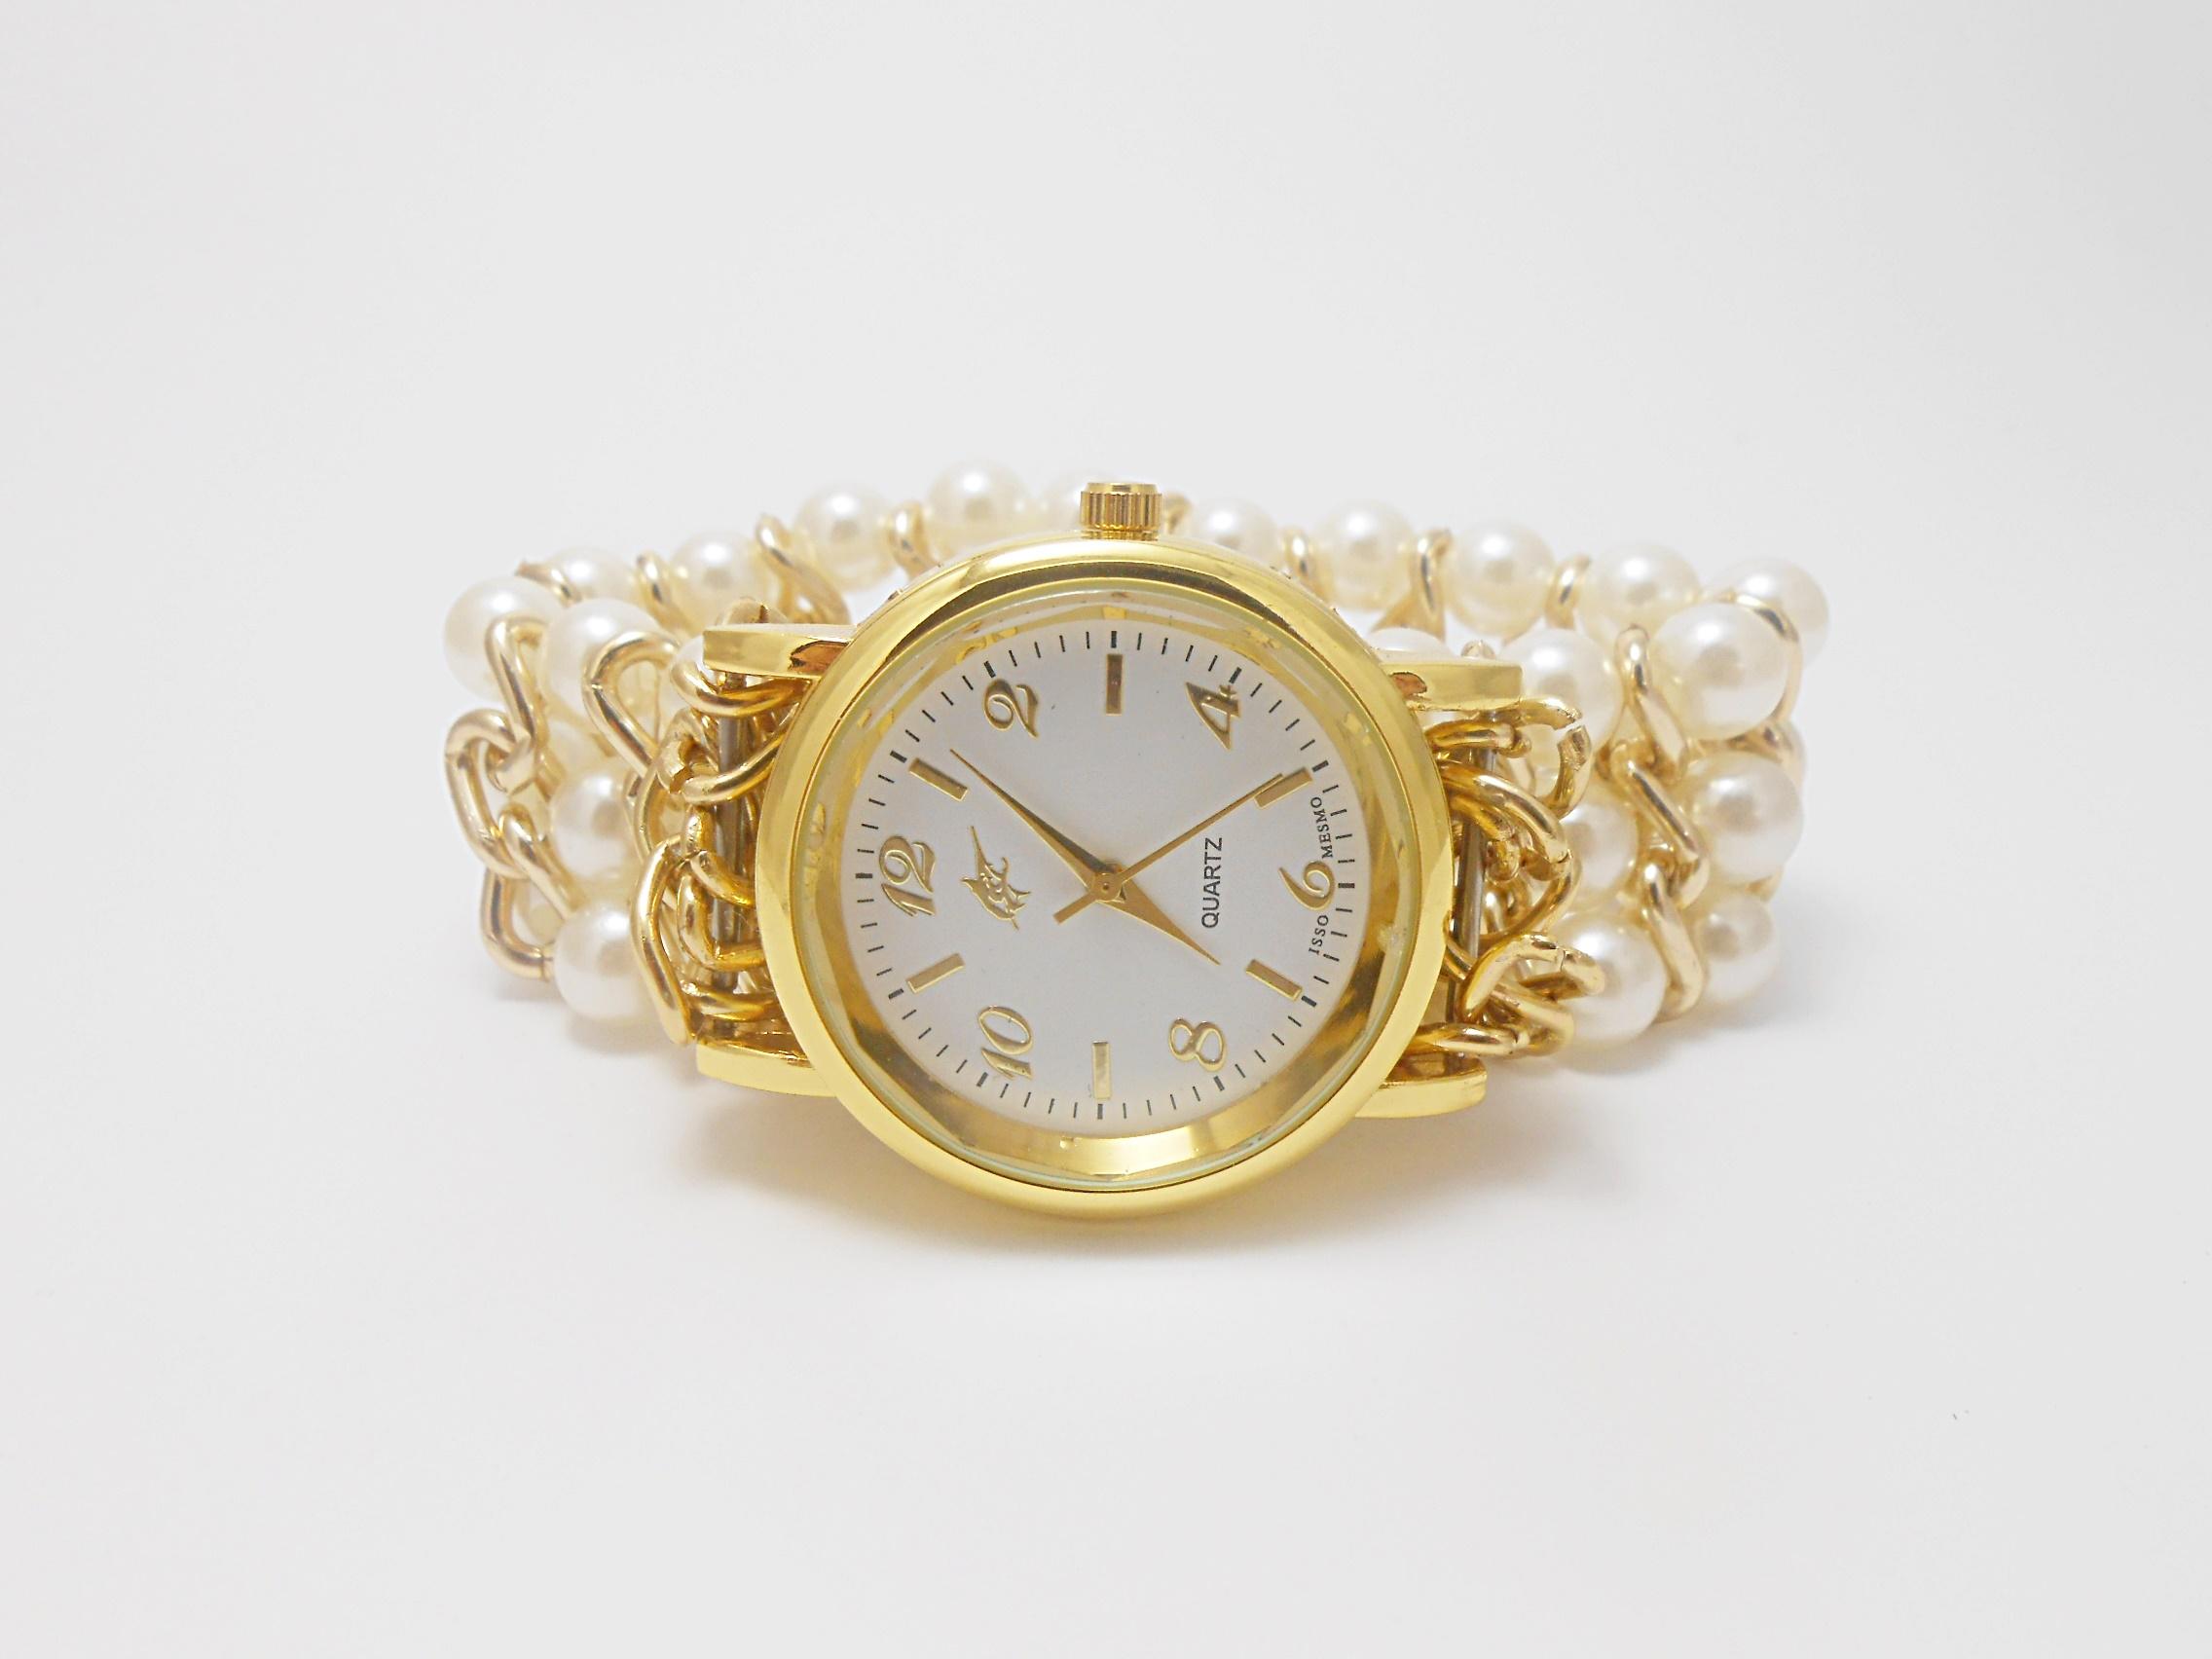 3b52b955b33 Relógio Feminino